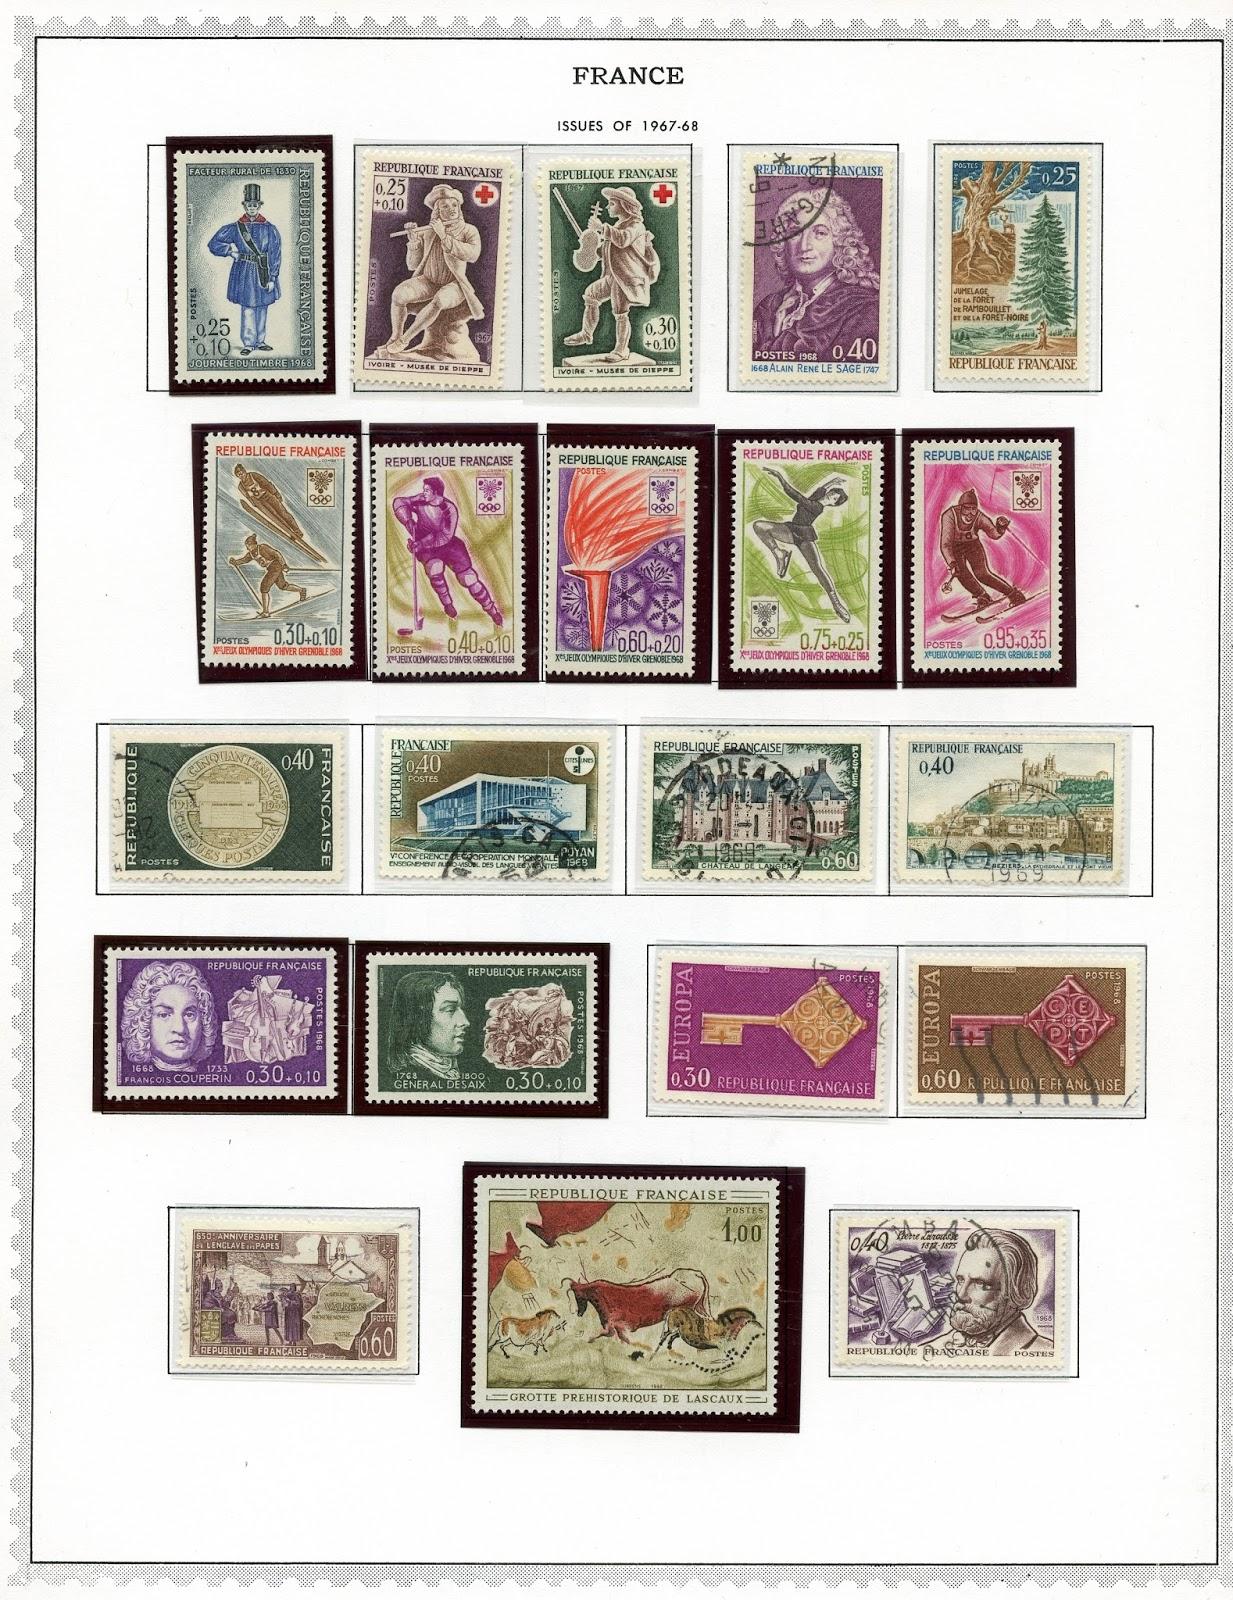 Minkus Global Supreme Album Pages - Stamp Community Forum